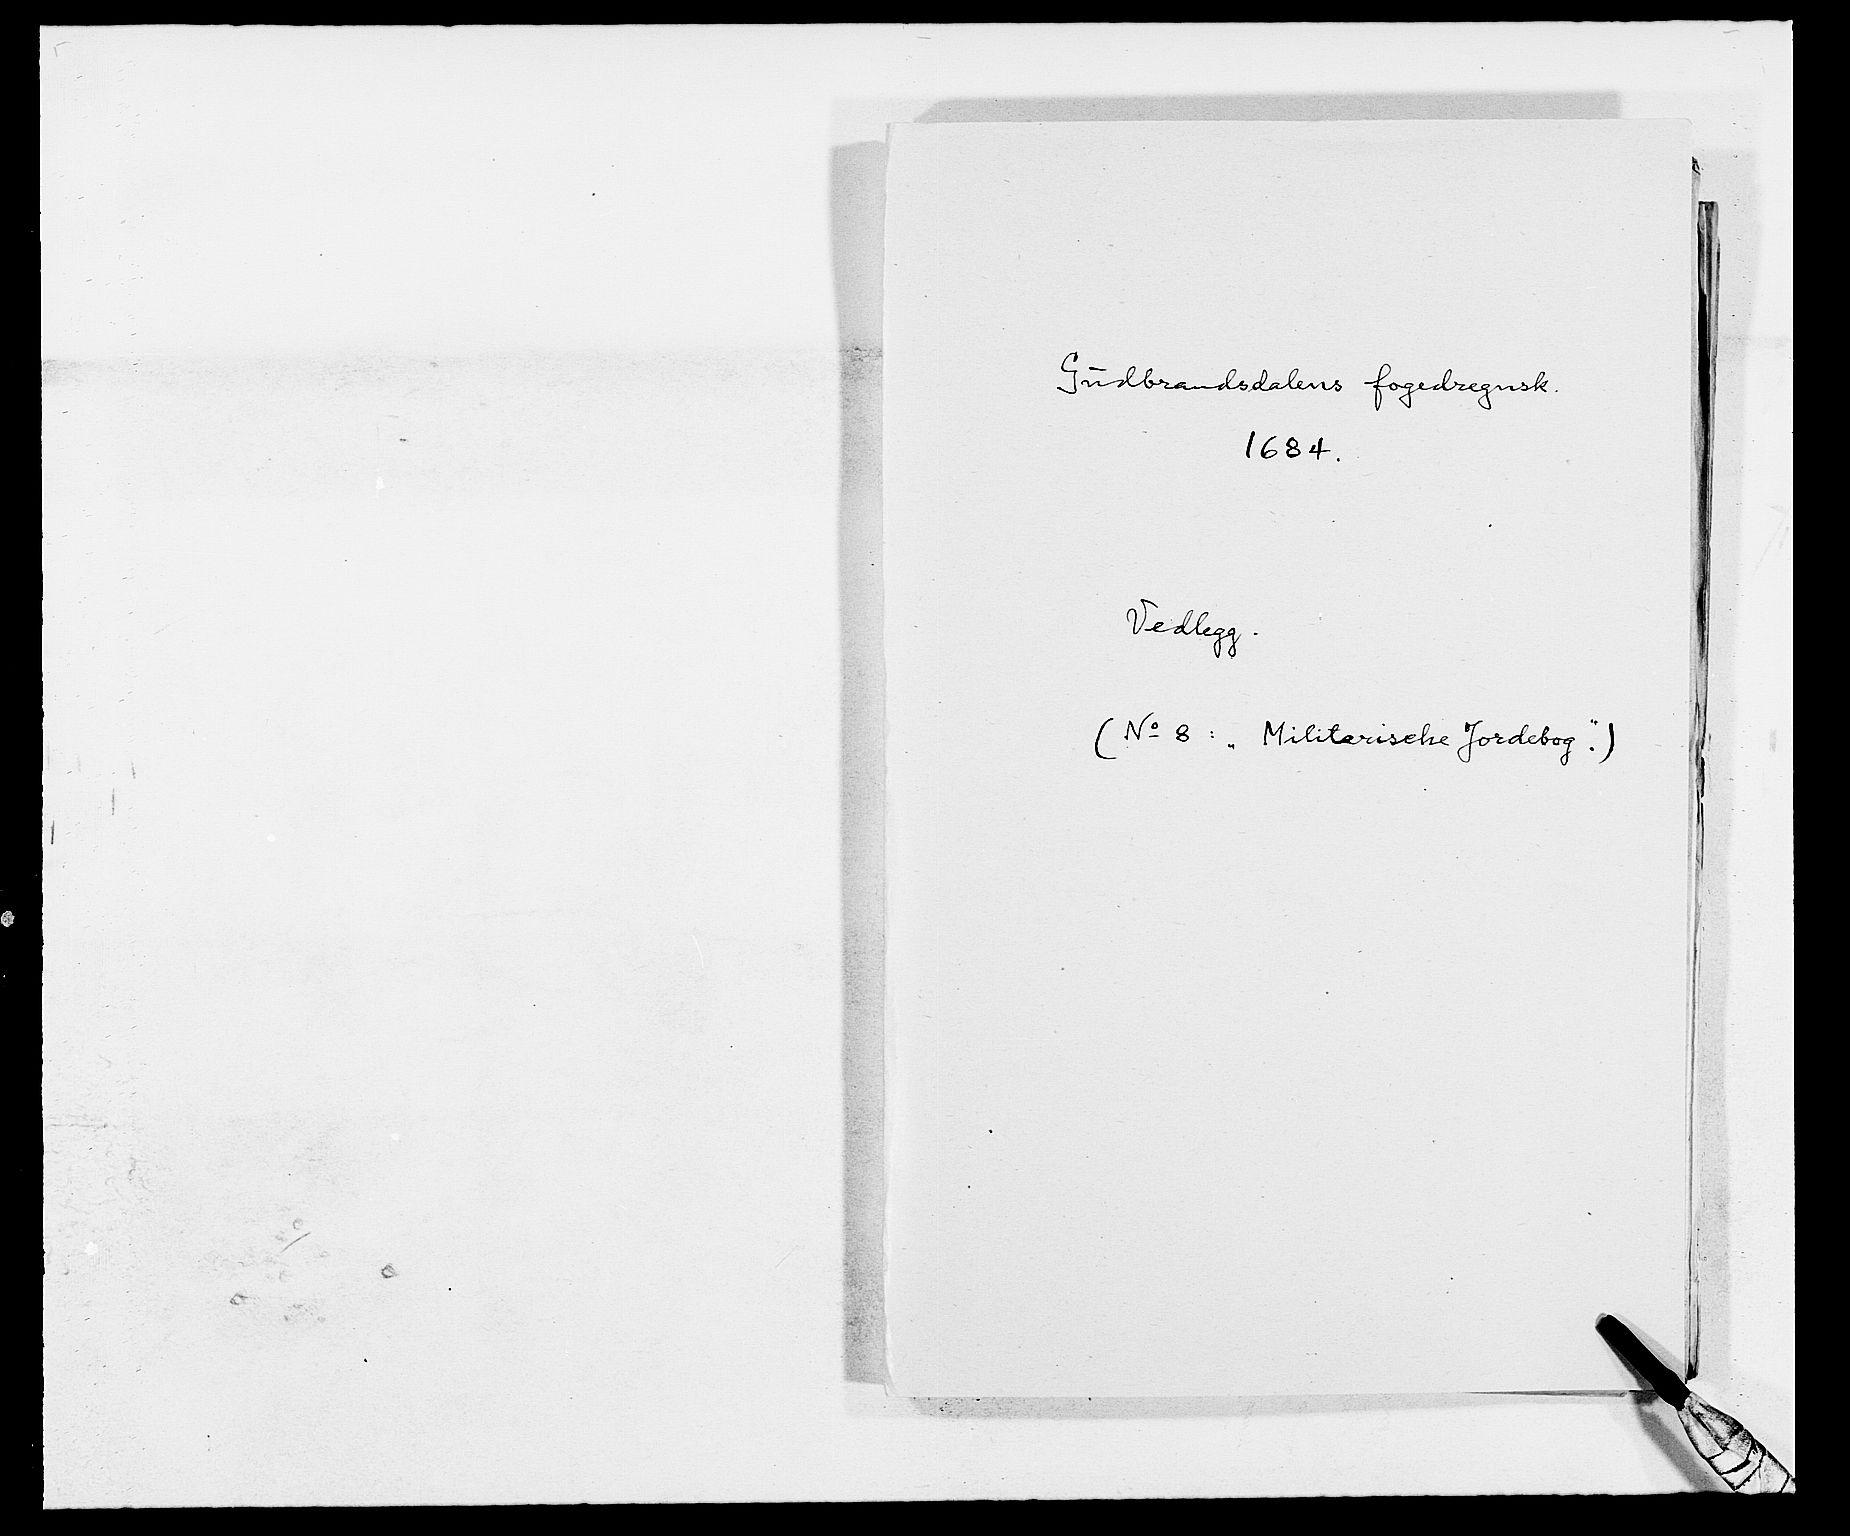 RA, Rentekammeret inntil 1814, Reviderte regnskaper, Fogderegnskap, R17/L1159: Fogderegnskap Gudbrandsdal, 1682-1689, s. 310